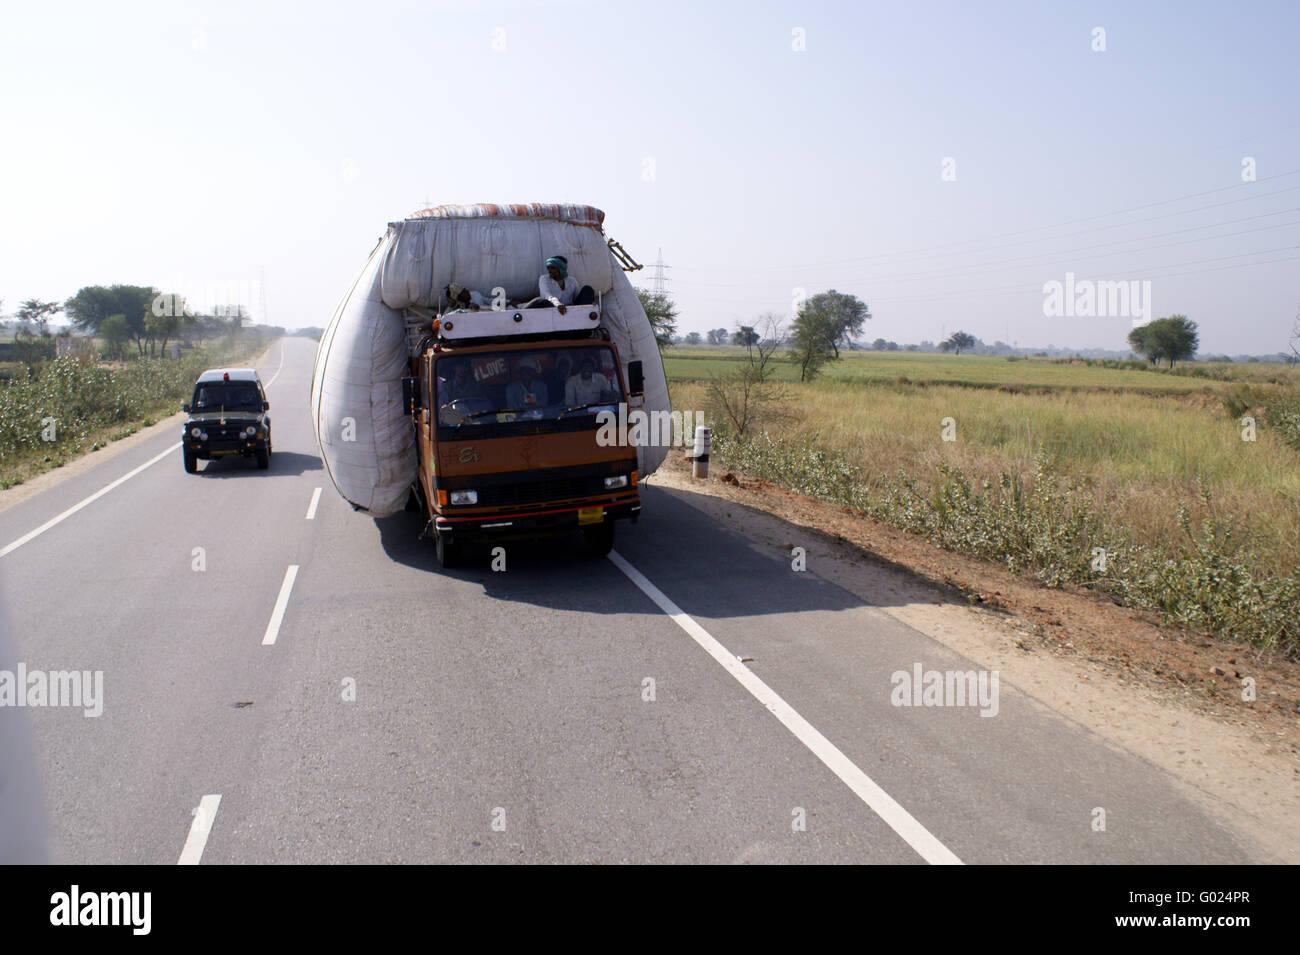 indischer Lasten und Personentransport / Indian loads and passenger transportation - Stock Image